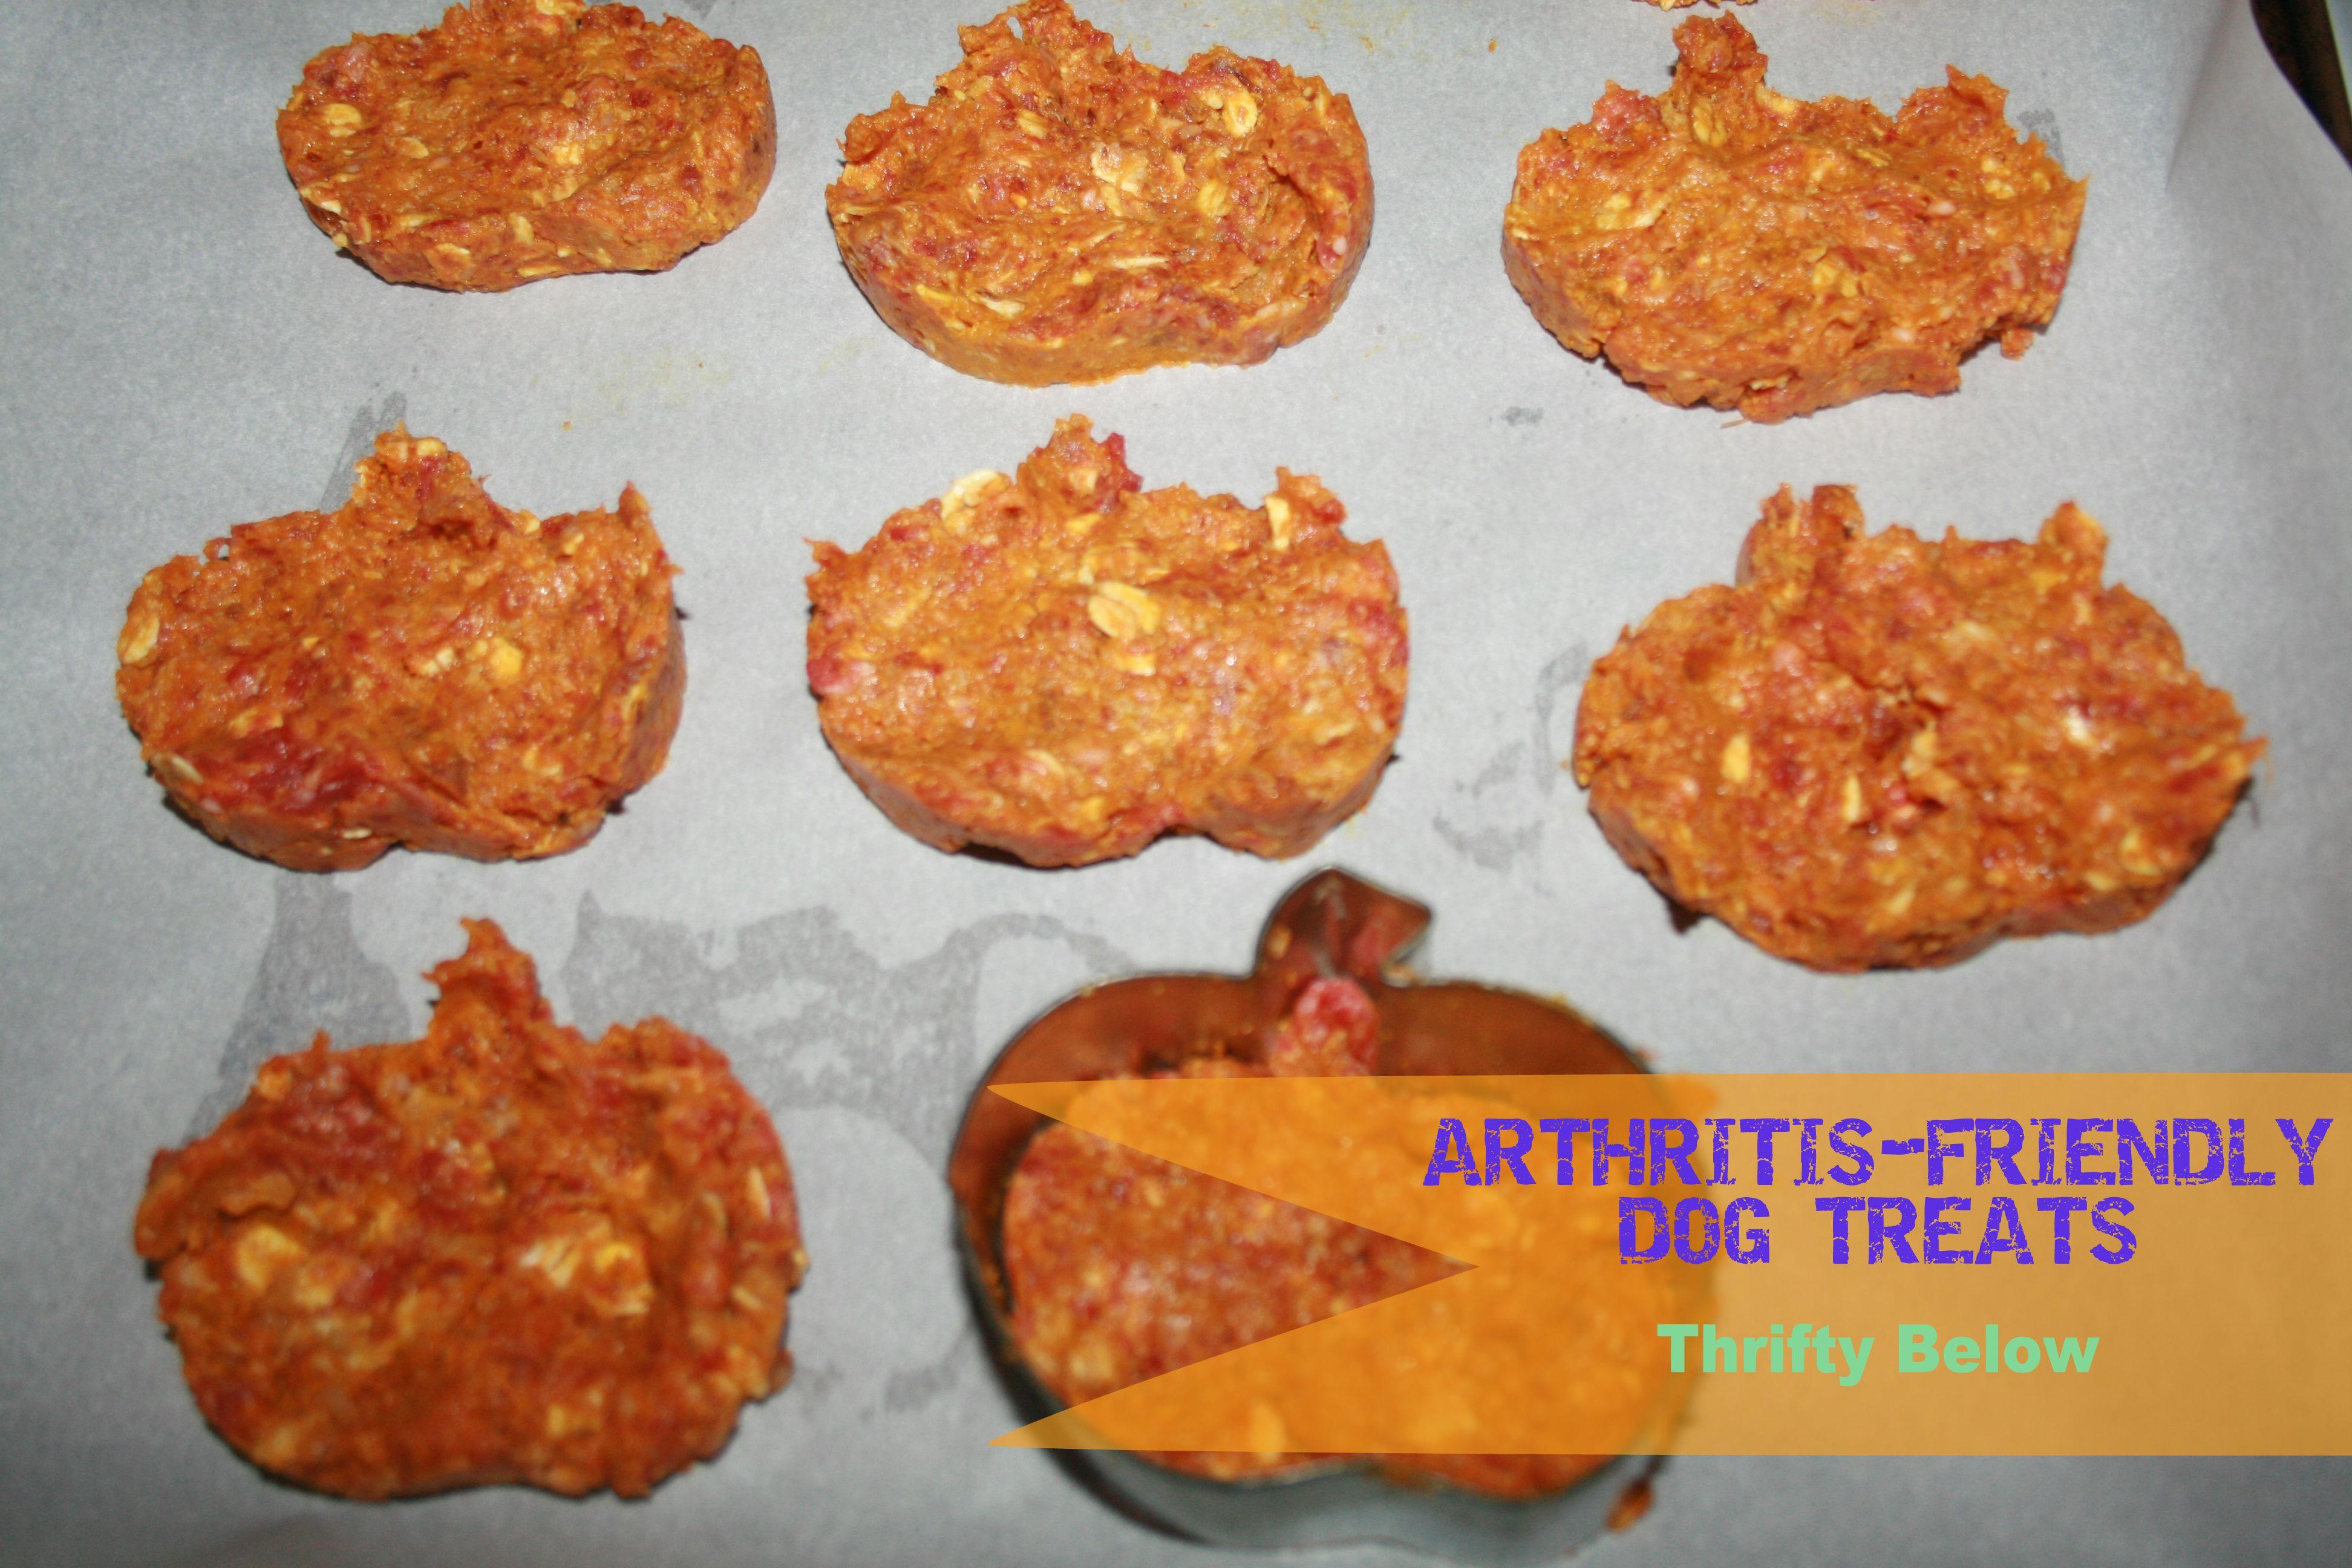 Arthritis Friendly Dog Treats Thrifty Below Recipe Homemade Dog Food Dog Food Recipes Pumpkin Dog Treats